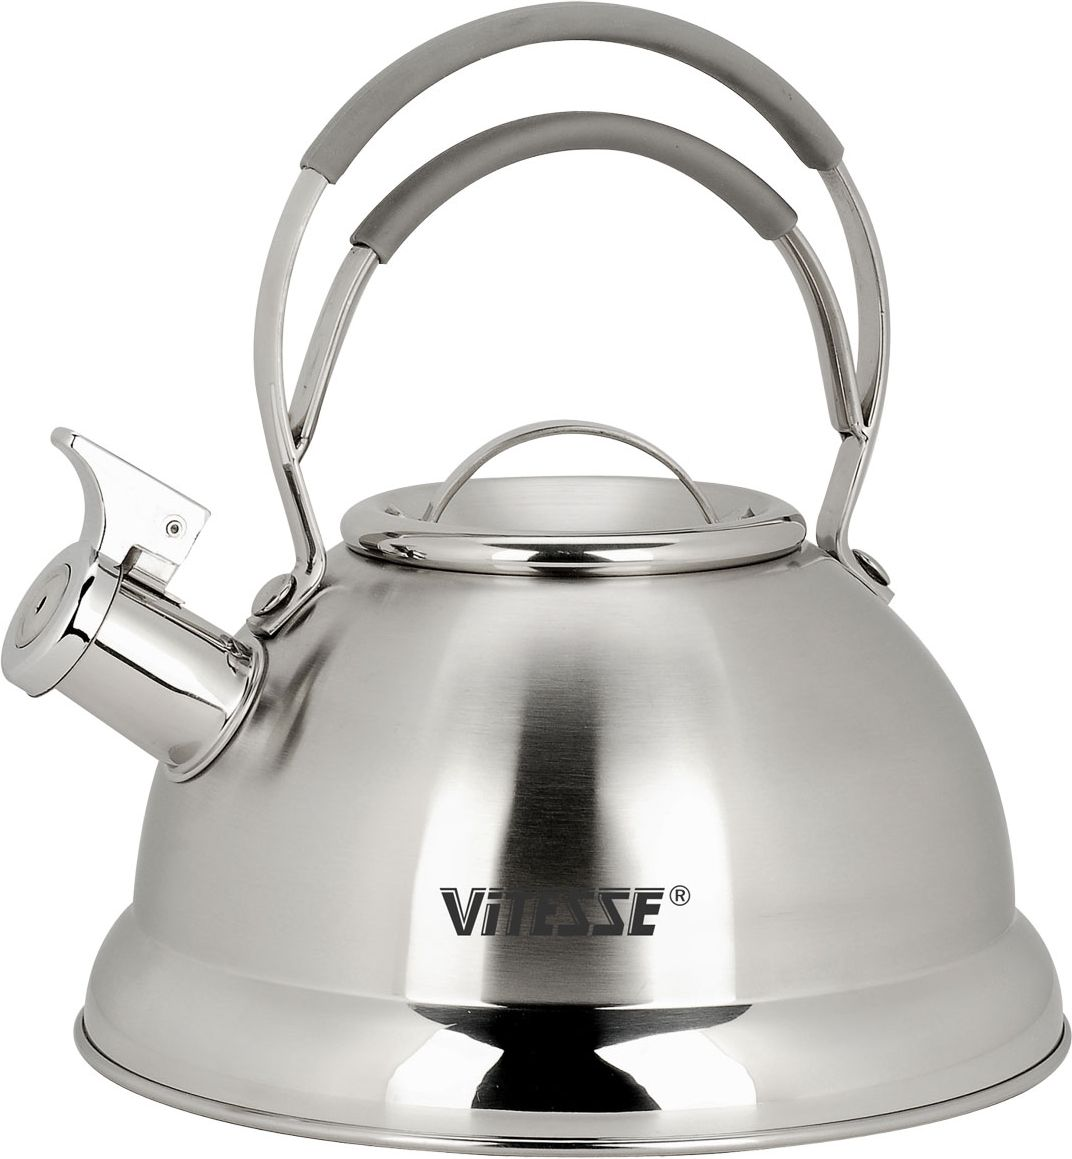 Чайник Vitesse Classic со свистком, 2,3 л. VS-7800